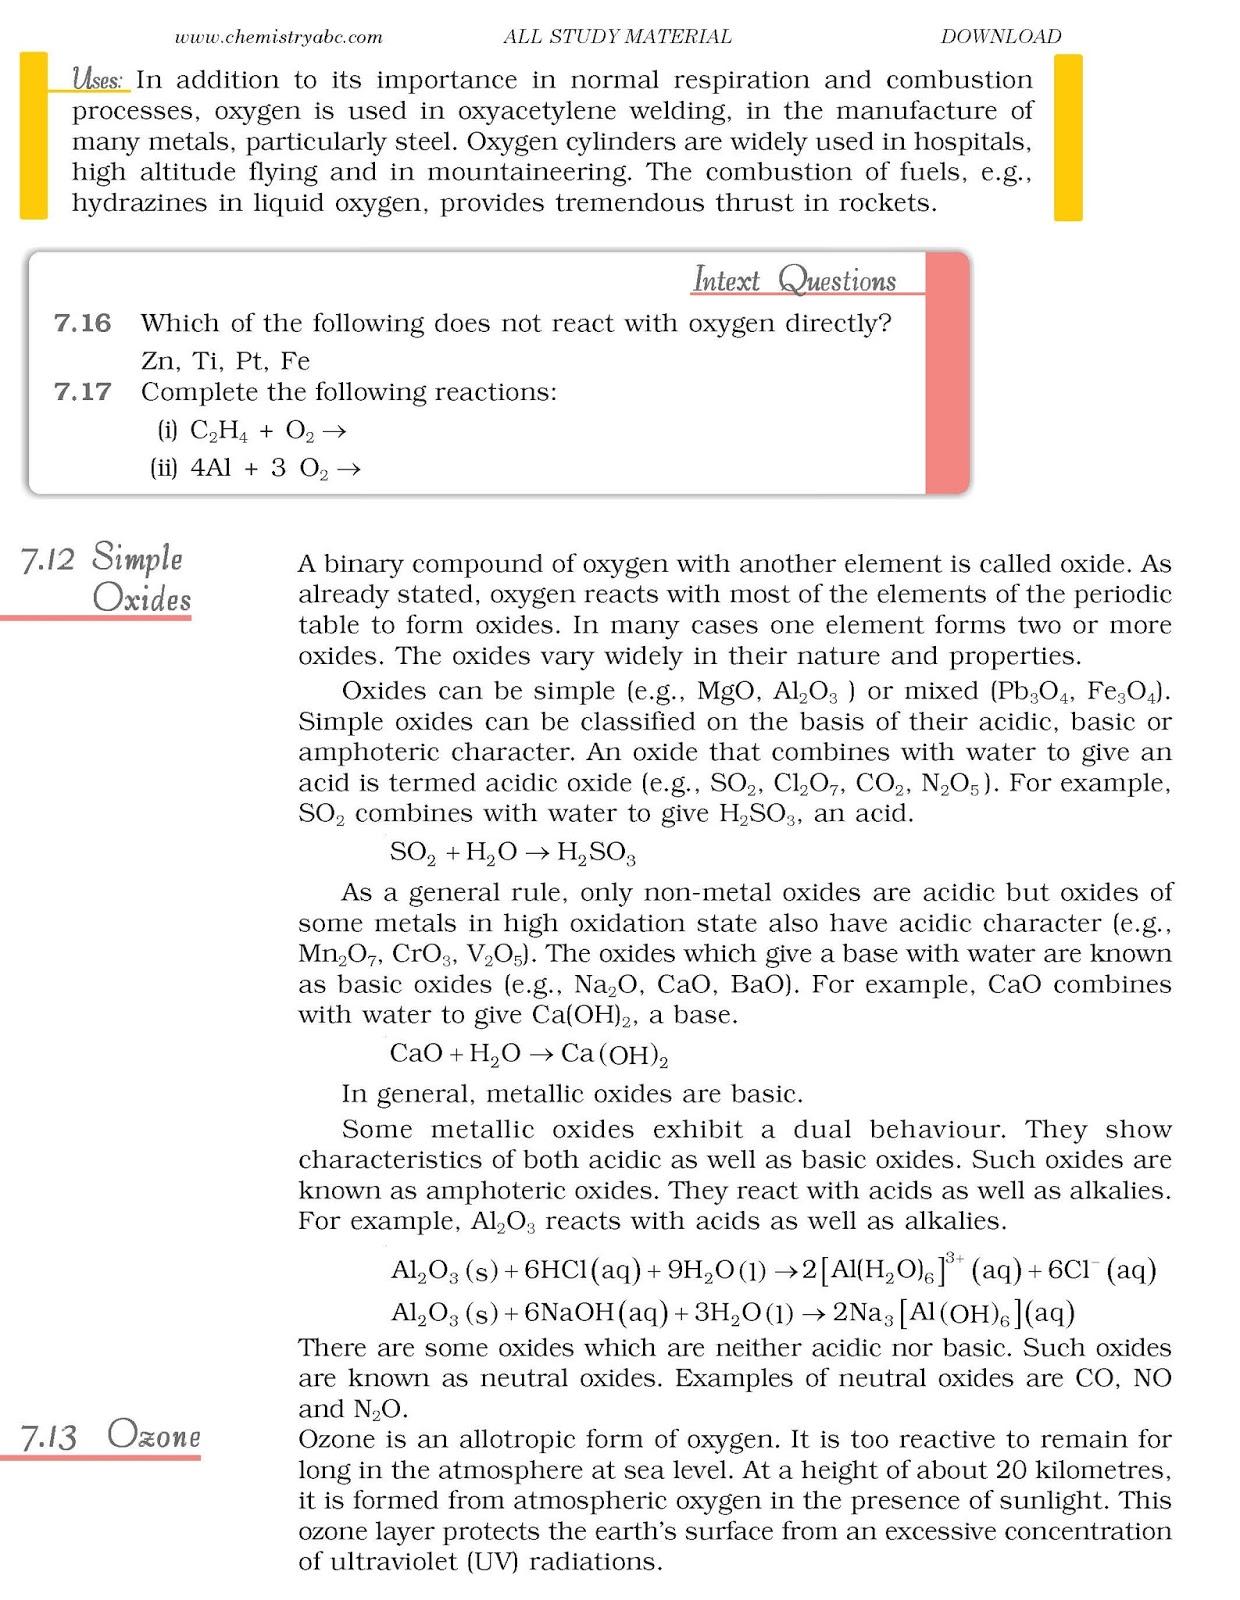 clayden organic chemistry free download filetype pdf